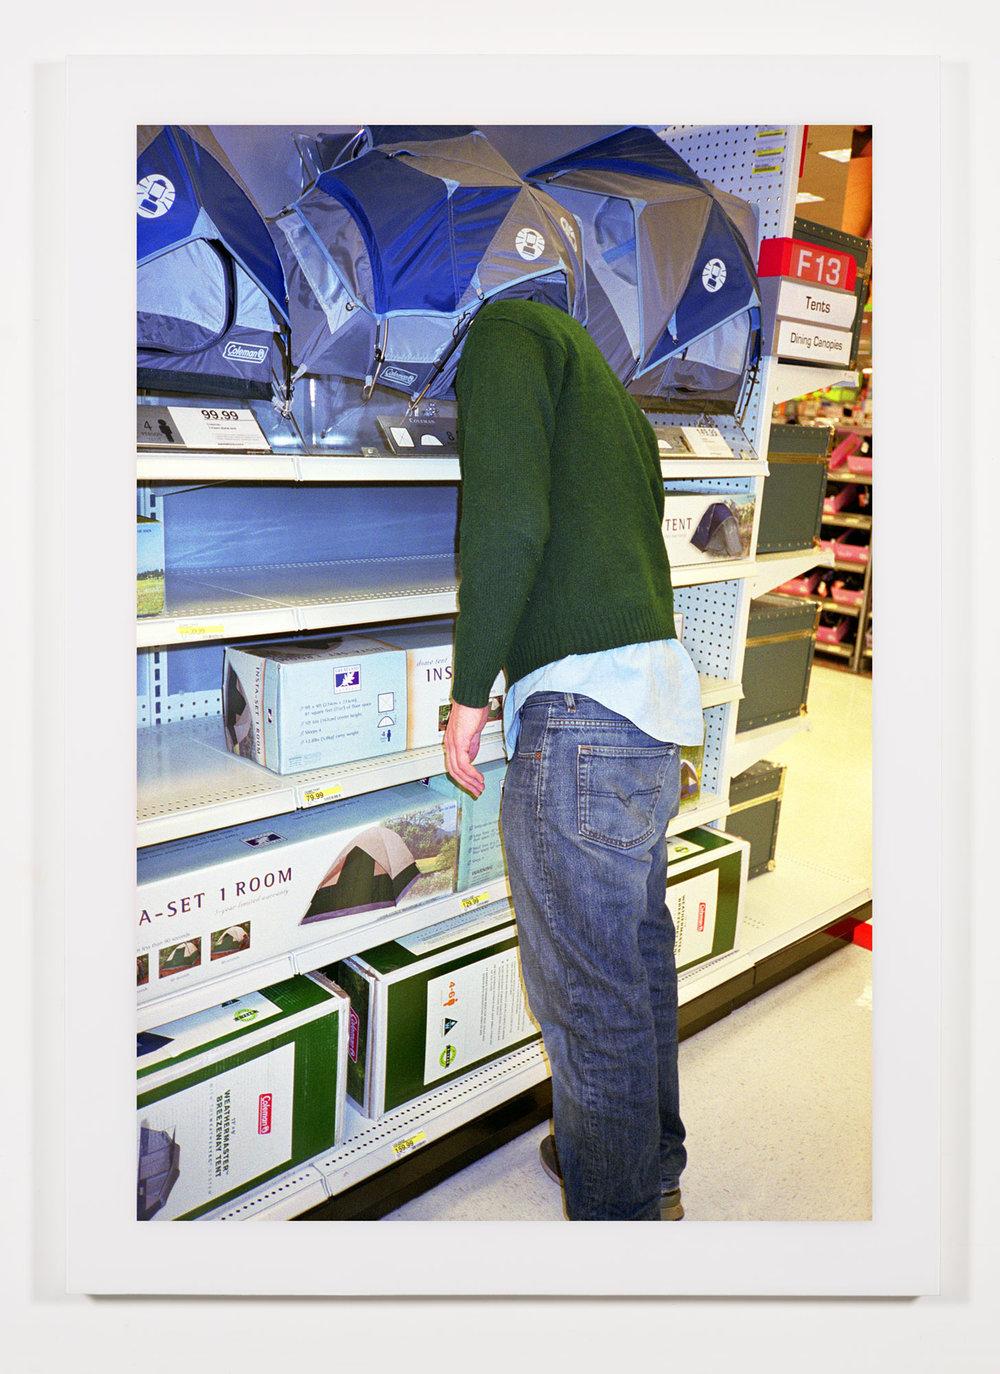 The Phenomenology of Shopping (Target, Dutchess County Mall, Kingston, NY)   2002  Chromogenic print  68 x 47 3/4 inches   The Phenomenology of Shopping, 2001–2003